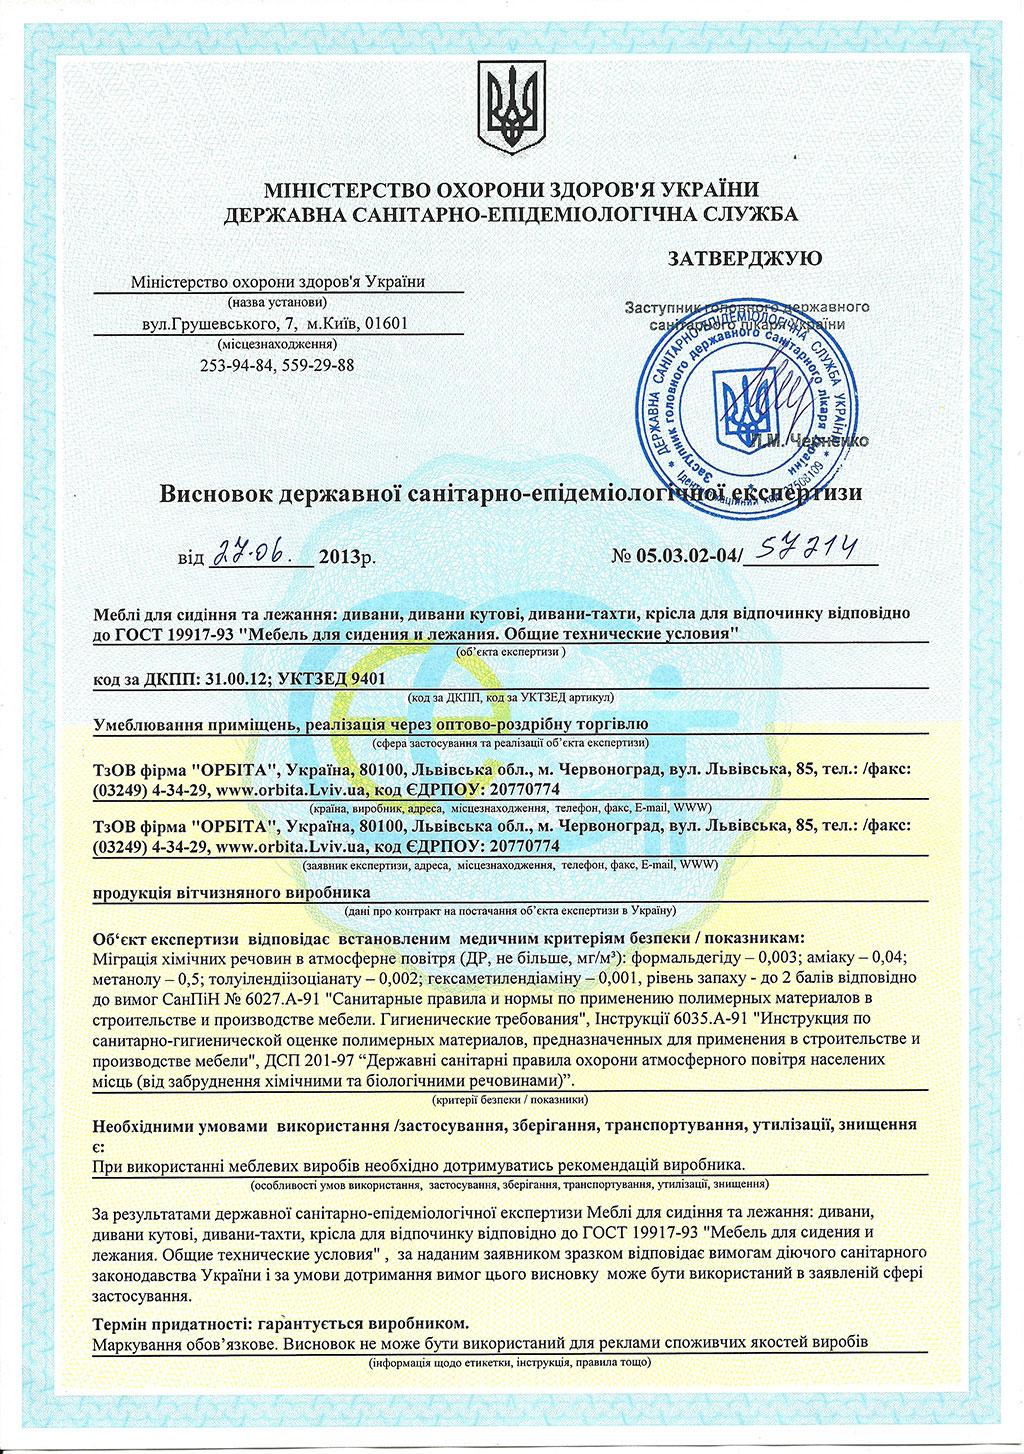 Сертификат качества фабрики Орбита